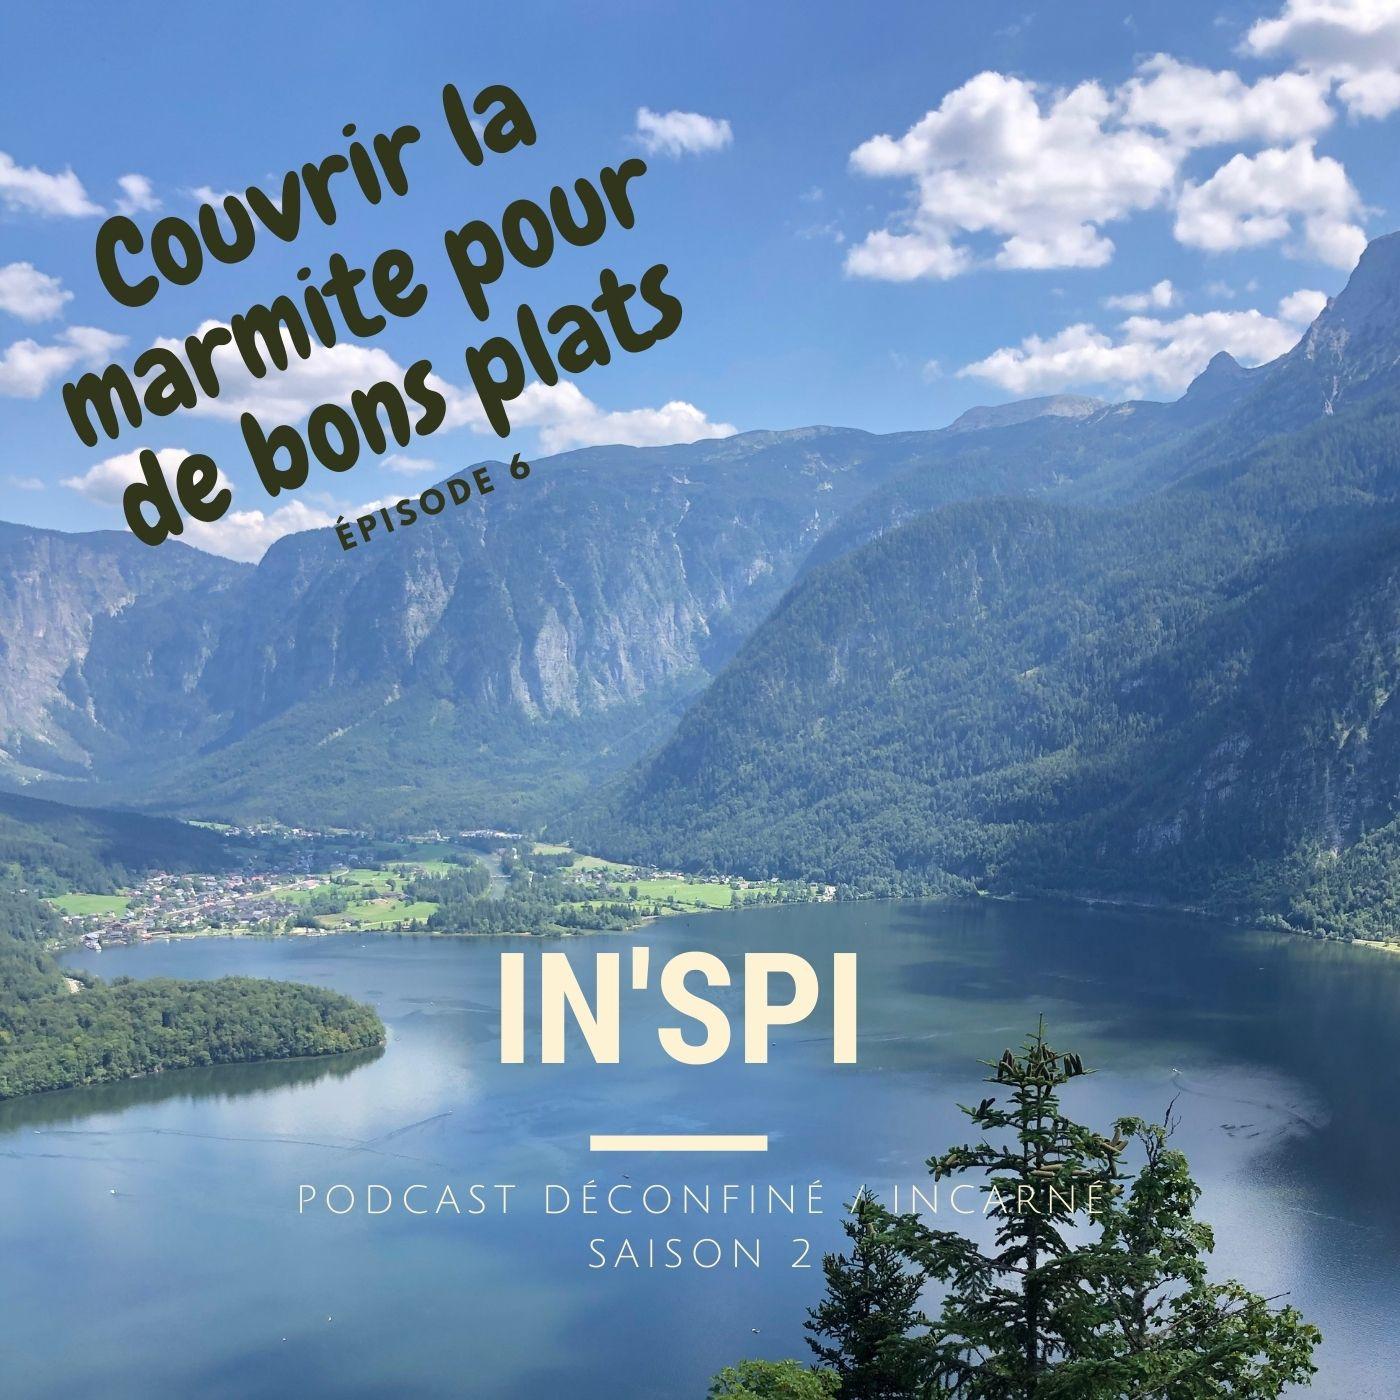 https://medias.podcastics.com/podcastics/episodes/1505/artwork/couvrir-la-marmite-pour-de-bons-plats-inspi.jpg.74d969a02b5bef0a627ae28f425658ae.jpg